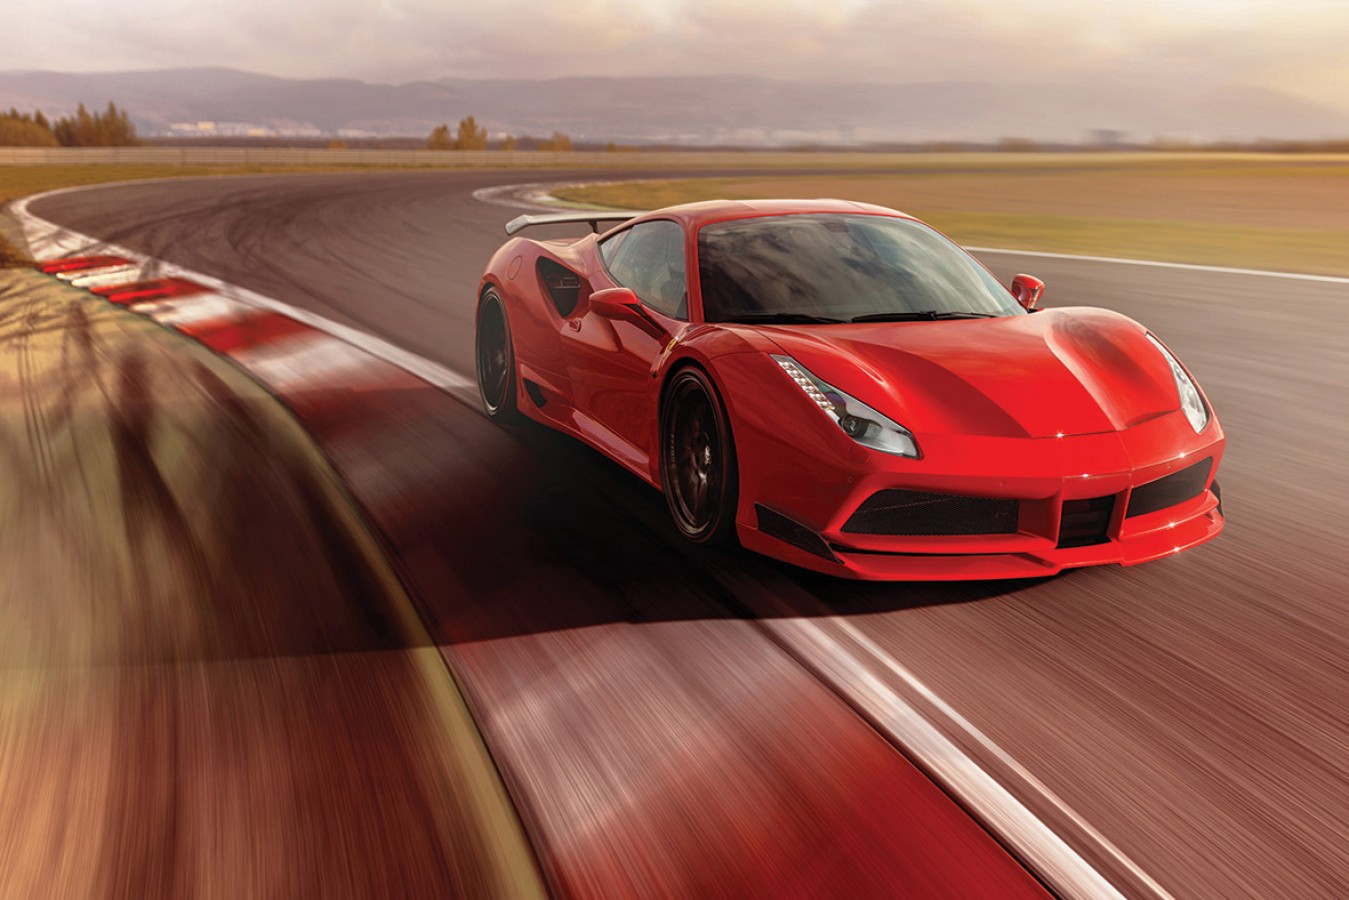 Fotomural Ferrari Passion A08-M924 Fotomural Ferrari Passion A08-M924